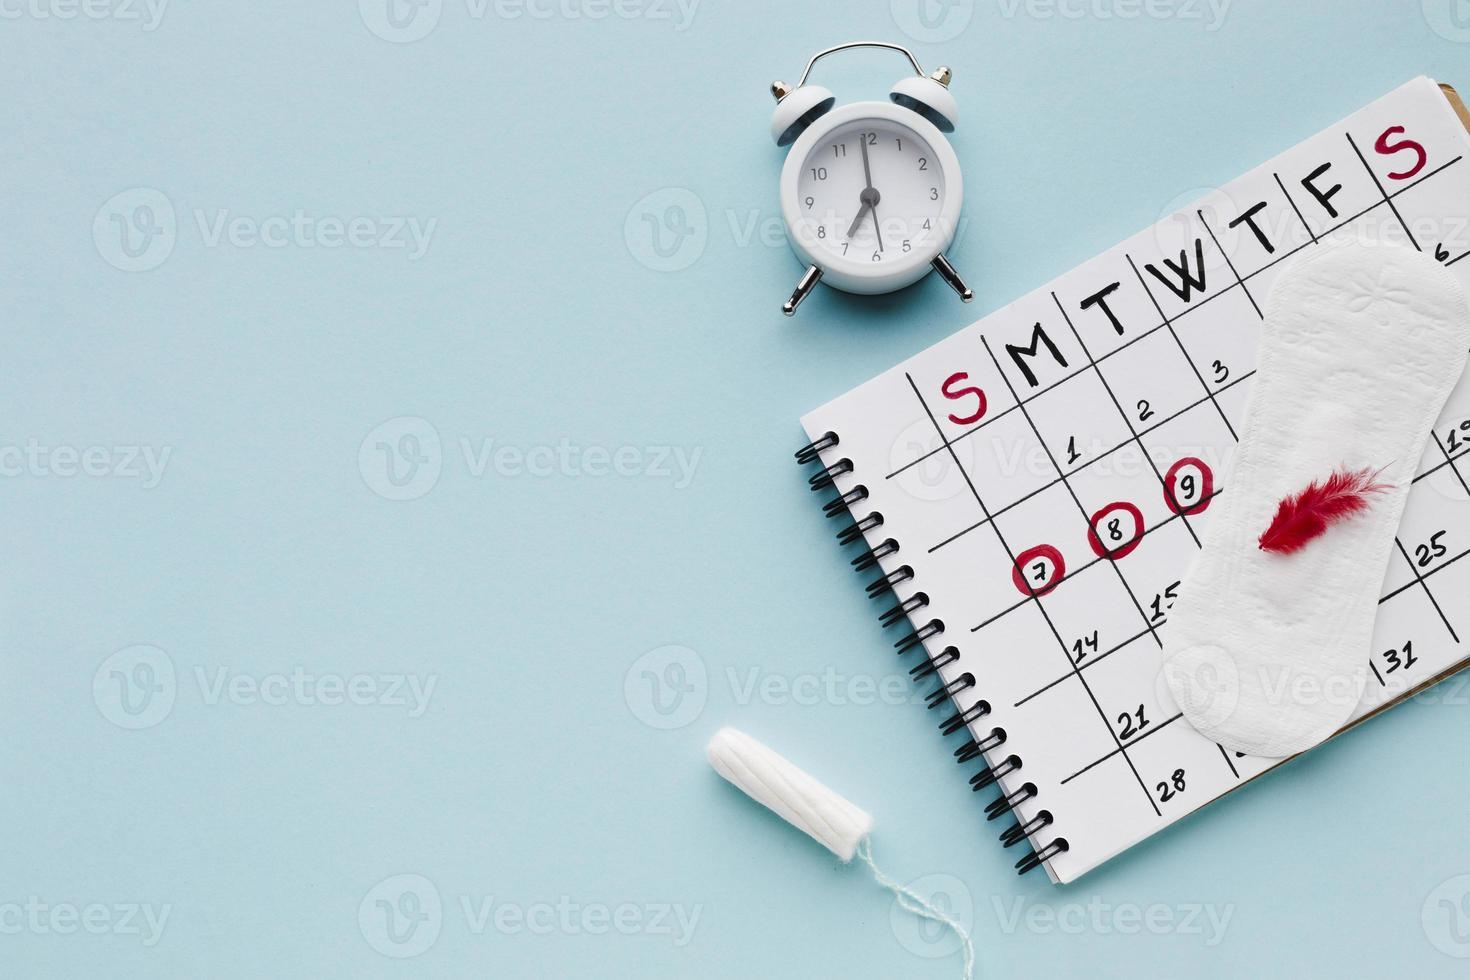 periodkalender med kopieringsutrymme foto